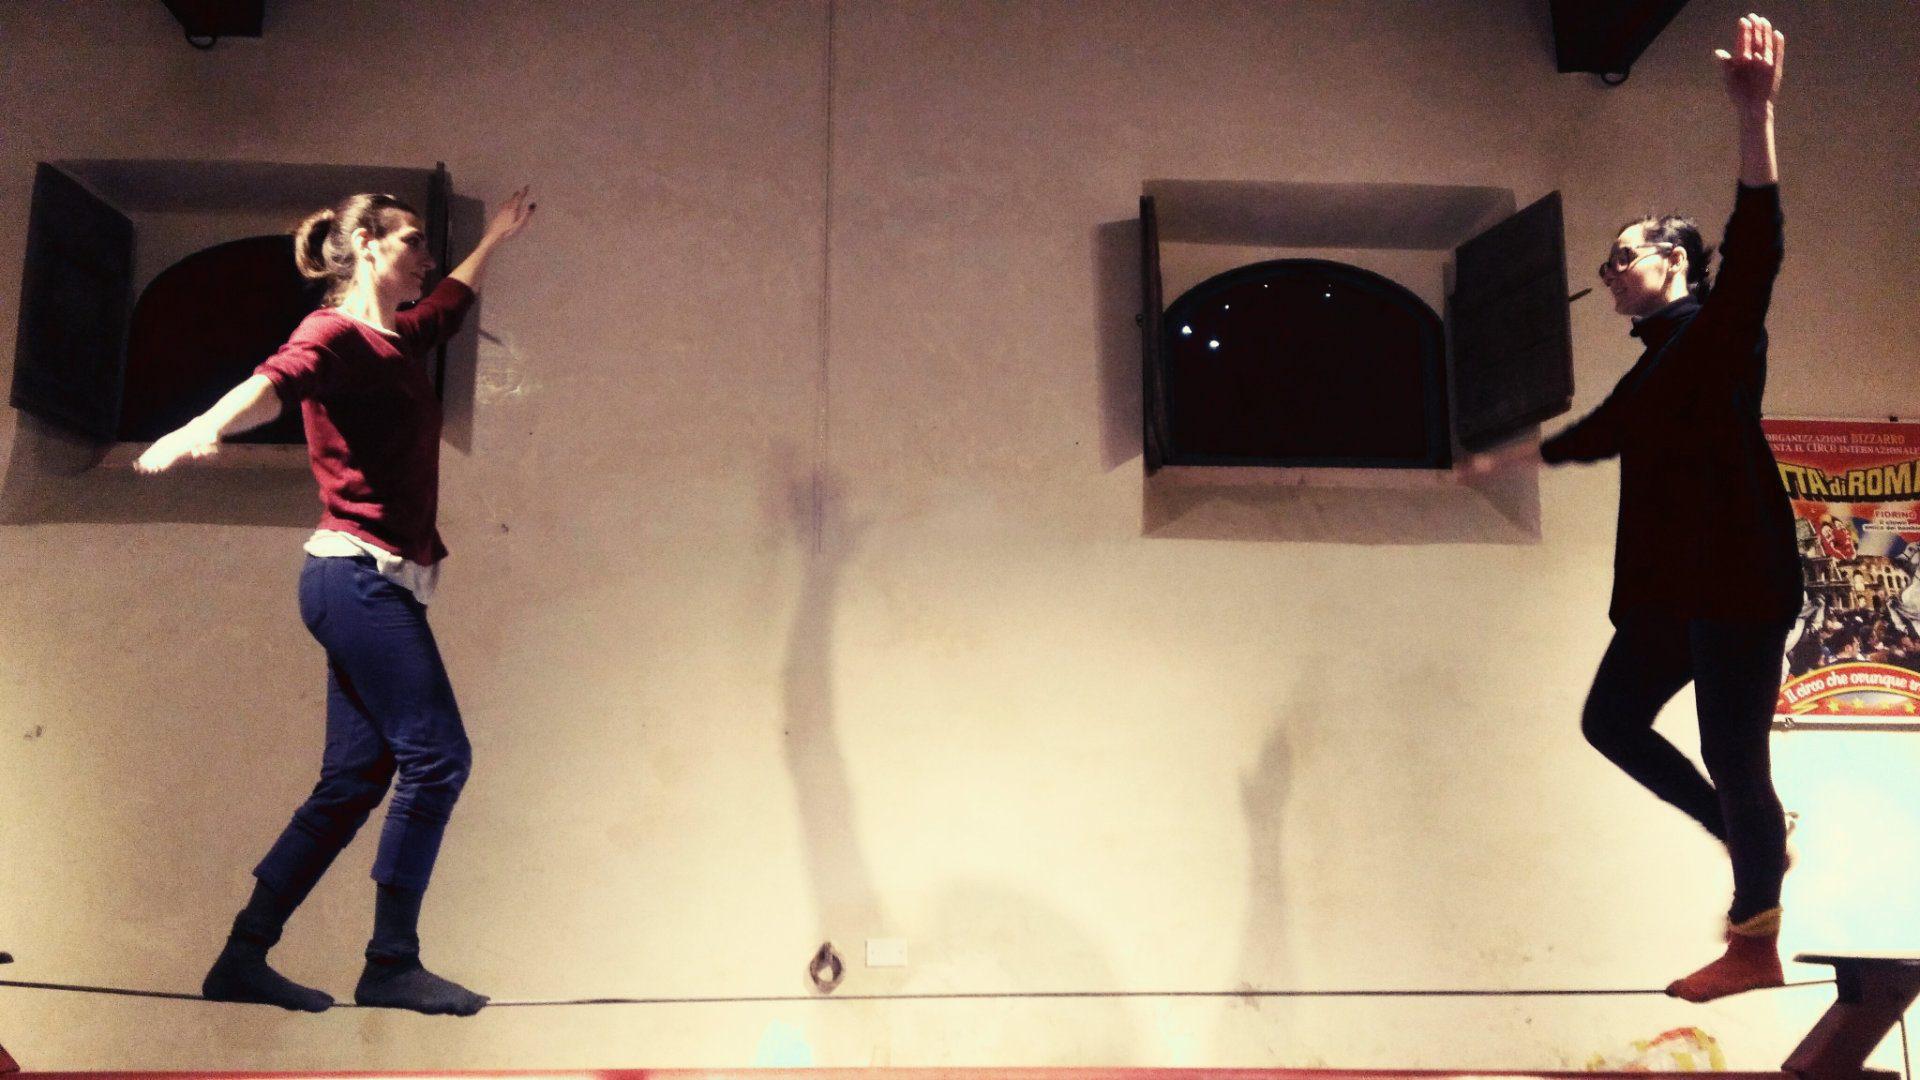 Artisti in Piazza Pennabilli festival / Workshop / Tra cielo e terra